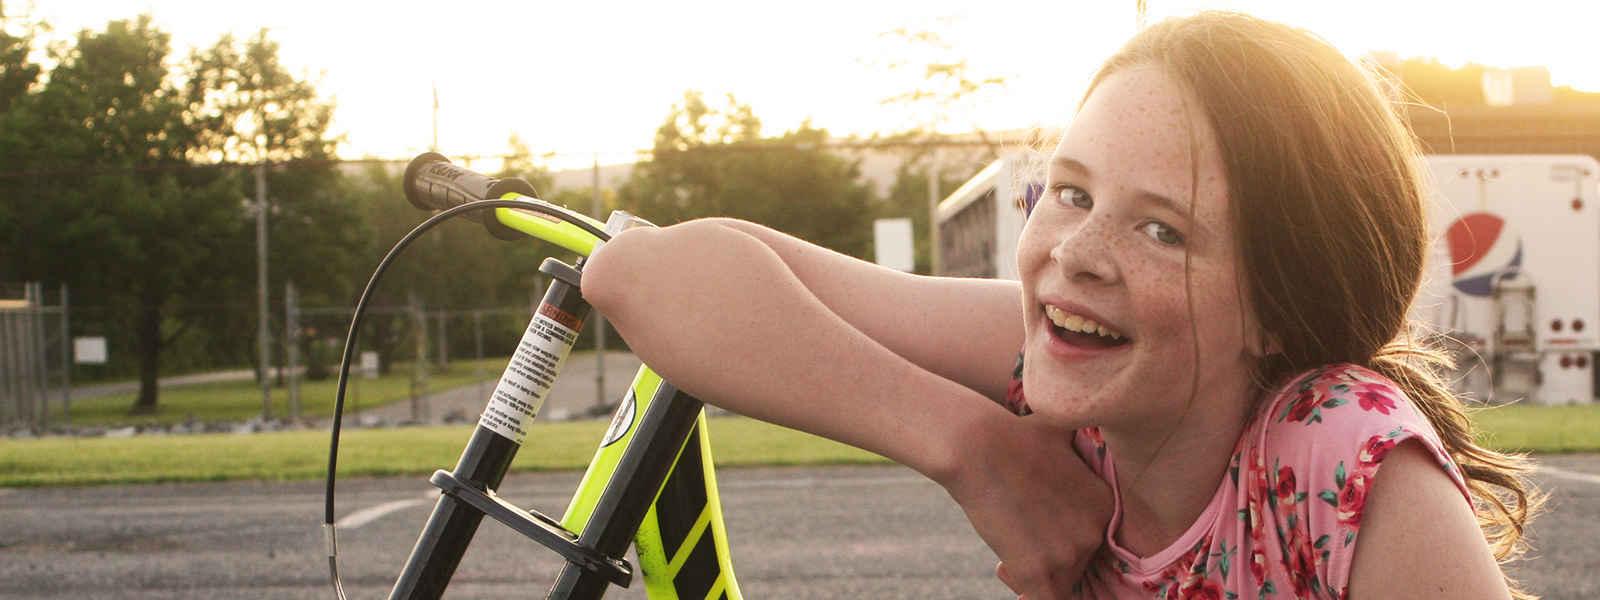 Sponsor a Teen, Change a Life image